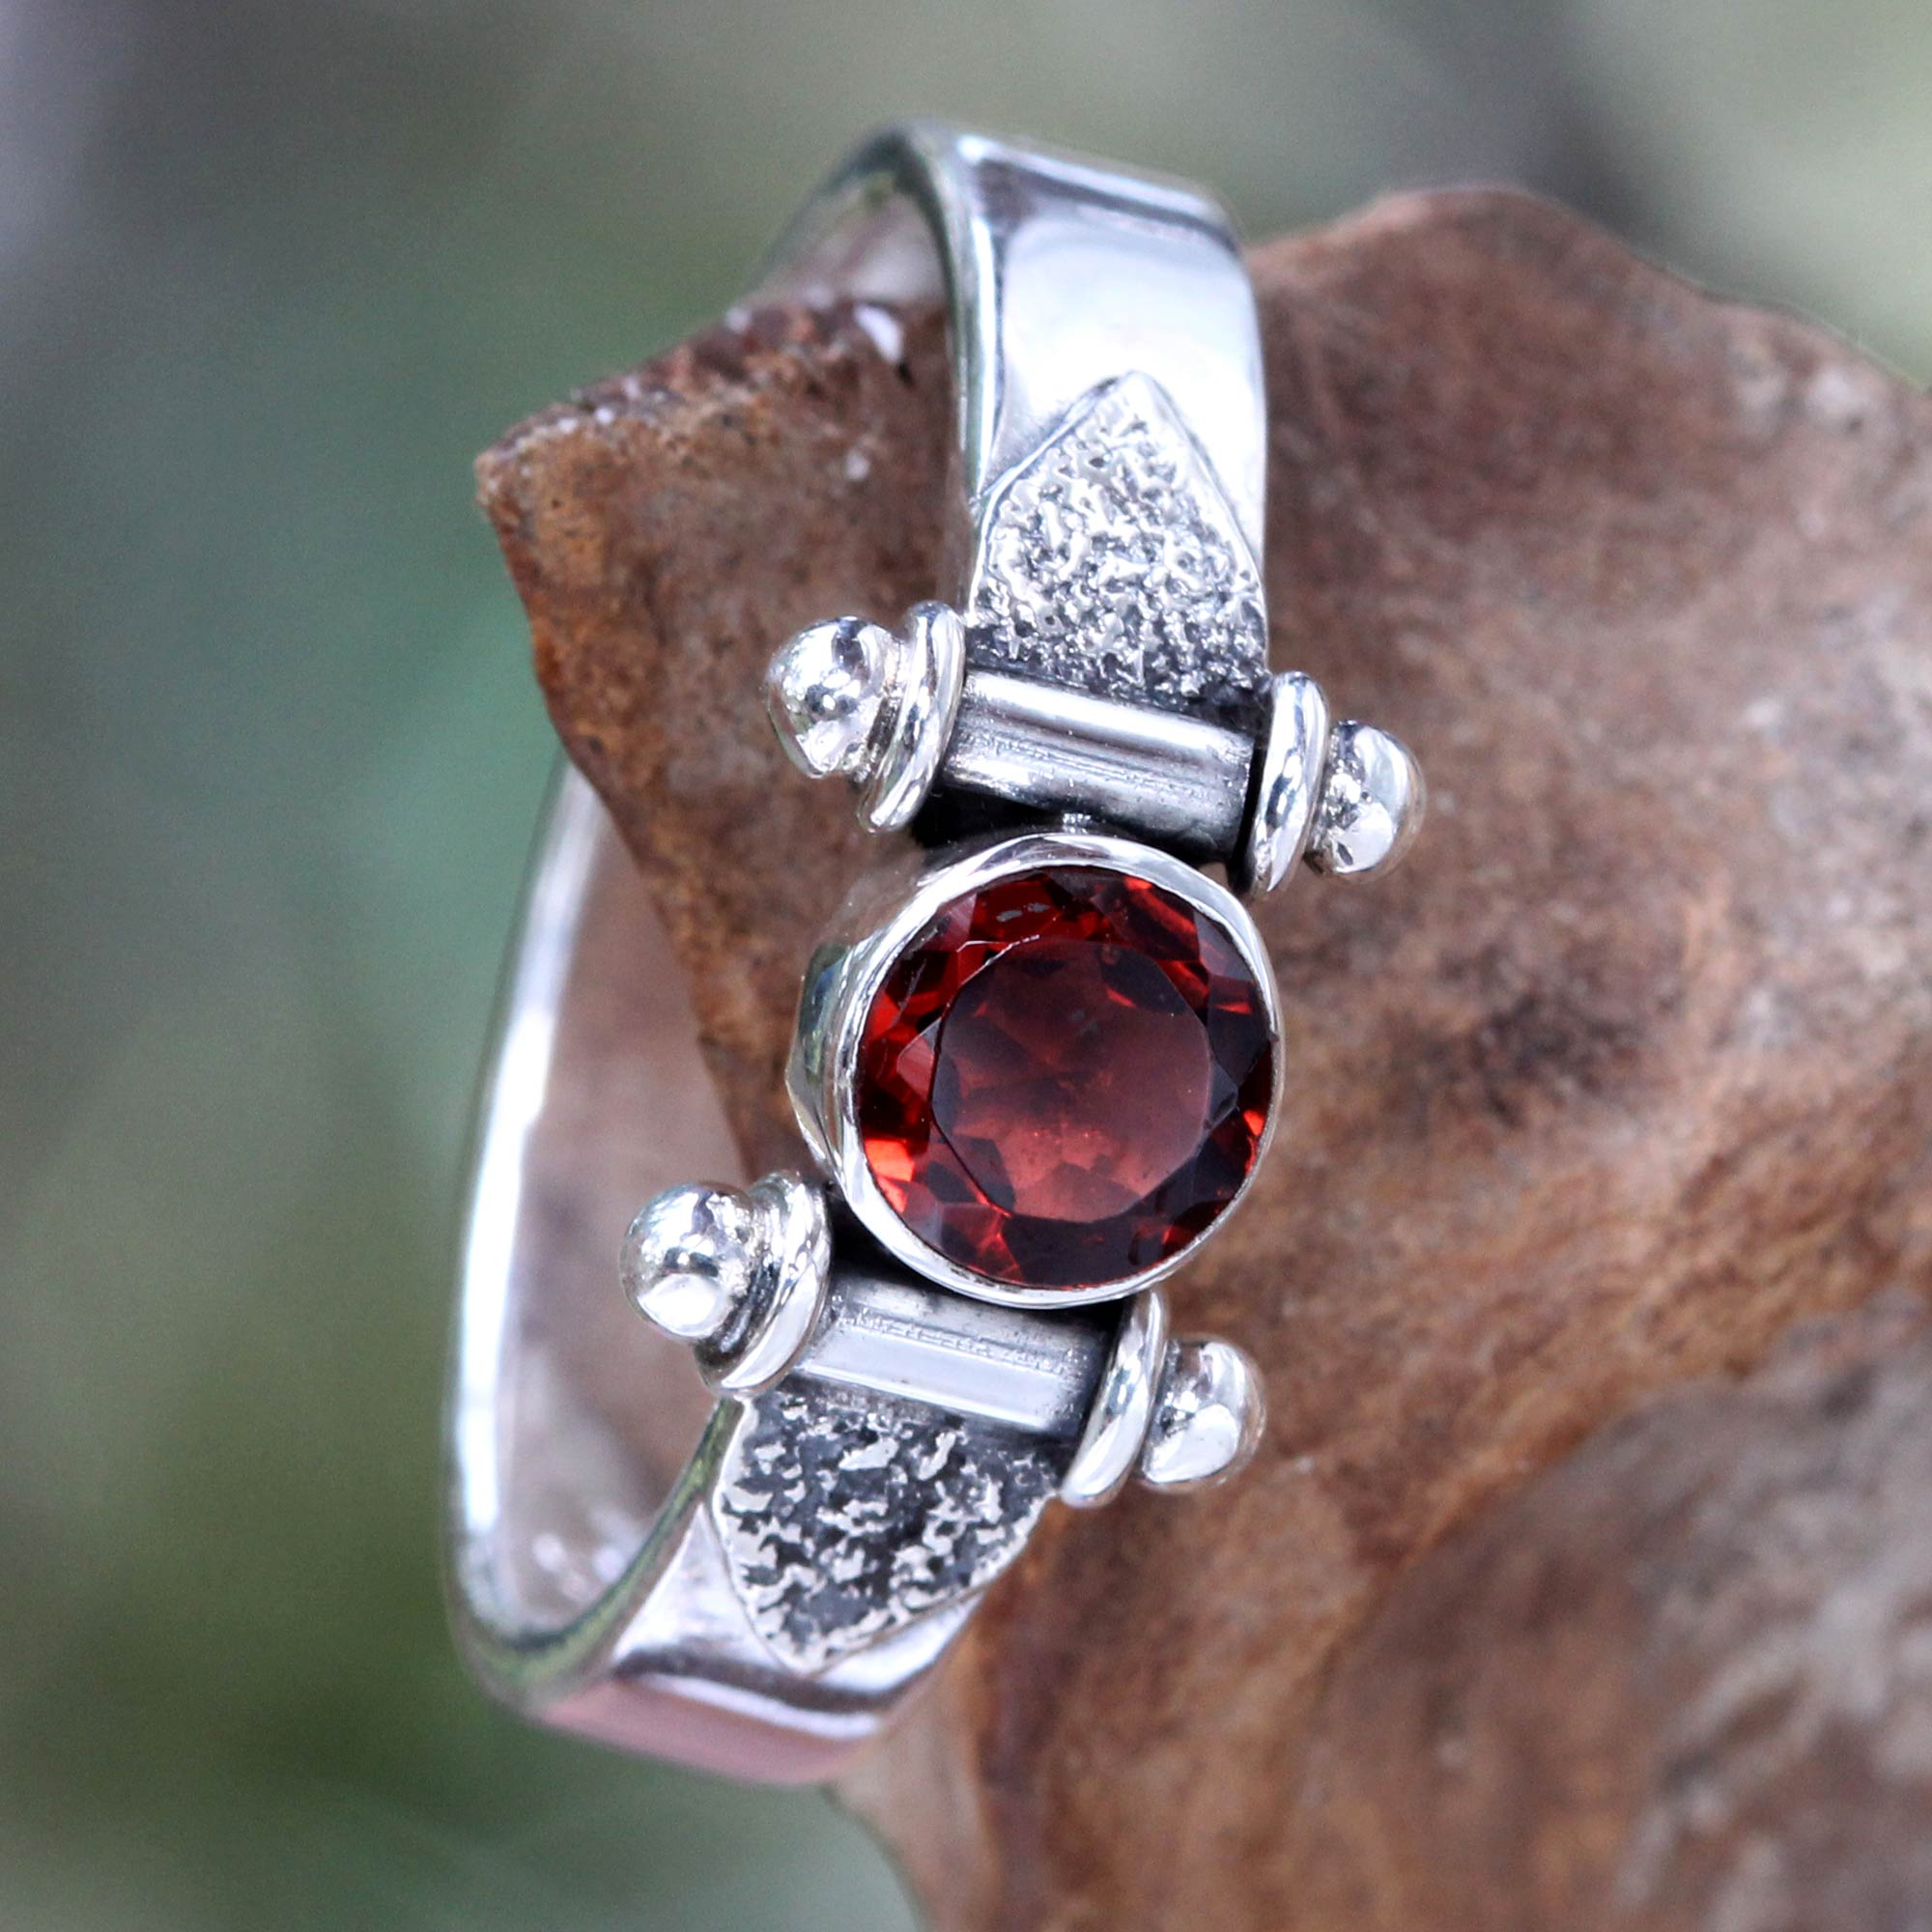 Garnet jewellery – The Jewellery you always desired